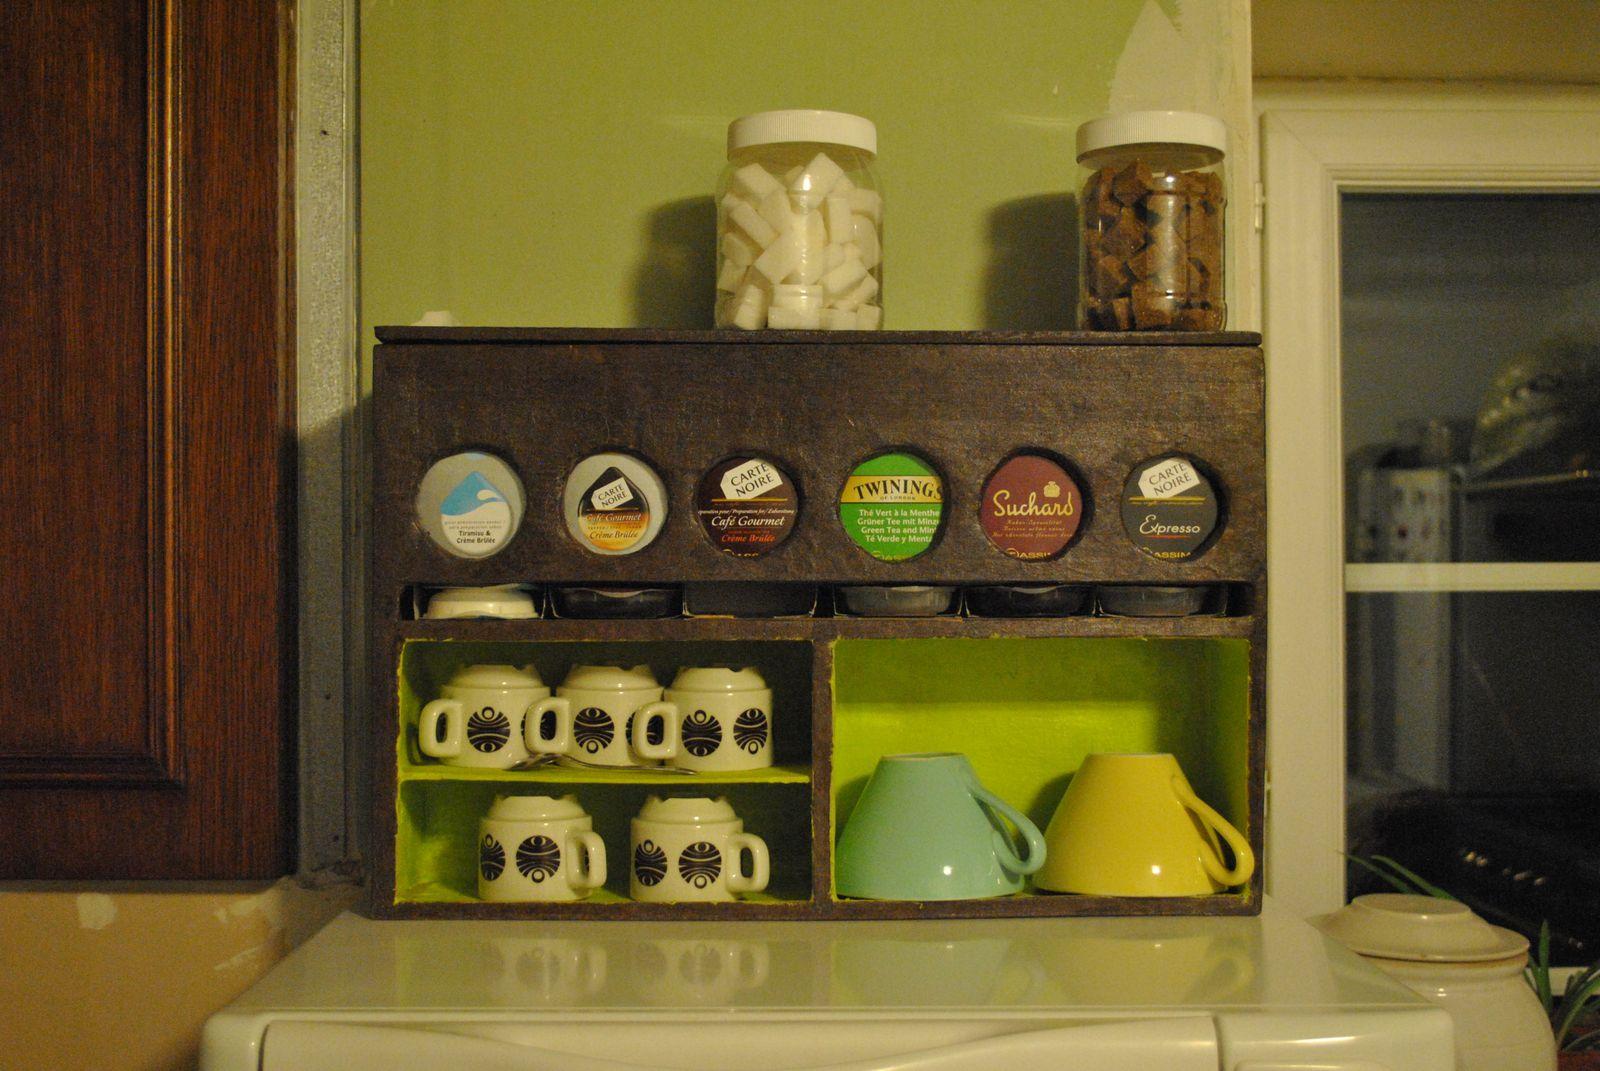 album distributeur dosettes tassimo. Black Bedroom Furniture Sets. Home Design Ideas